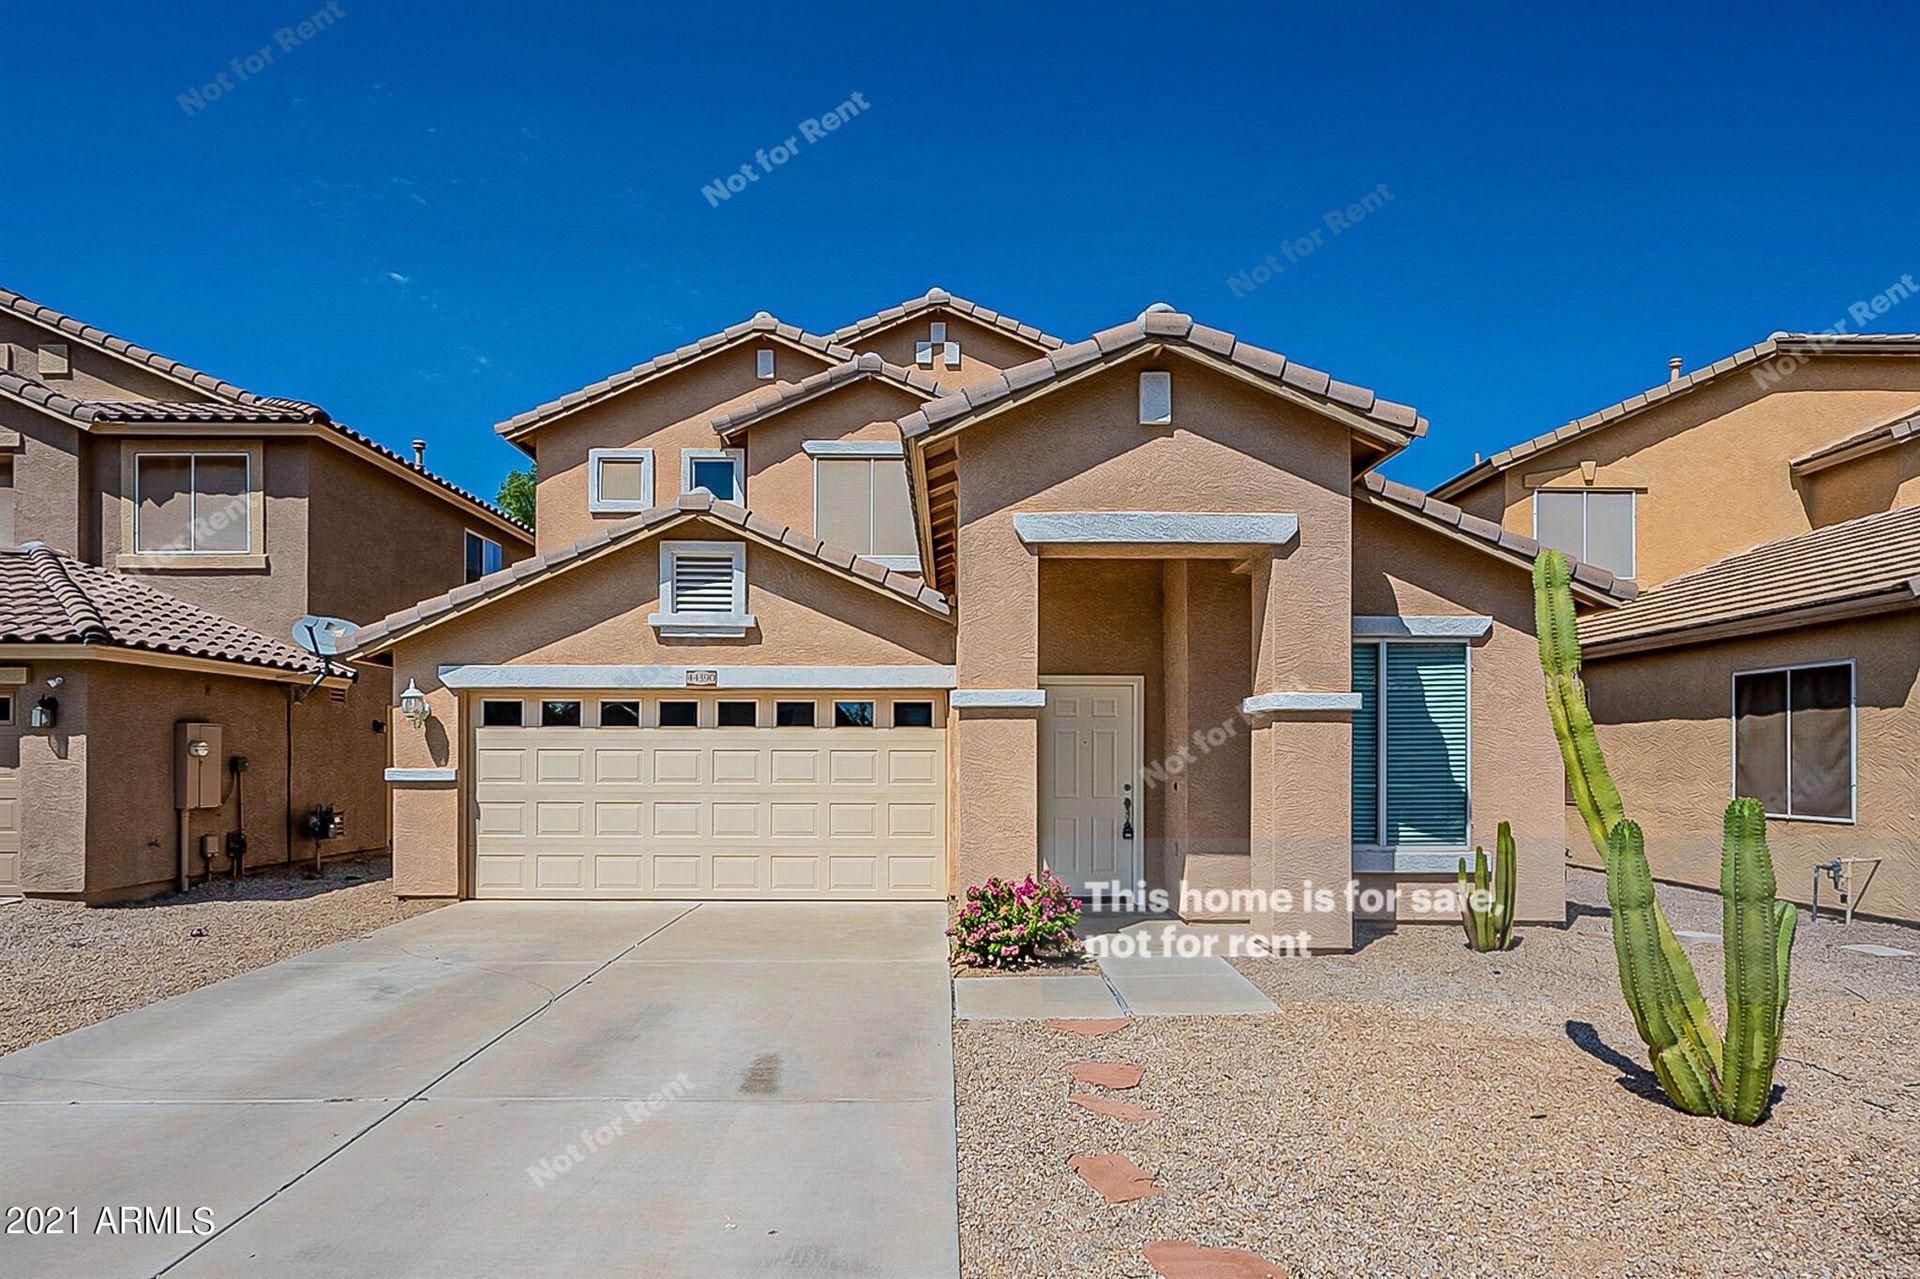 Photo for 44390 W MCCLELLAND Drive, Maricopa, AZ 85138 (MLS # 6293069)